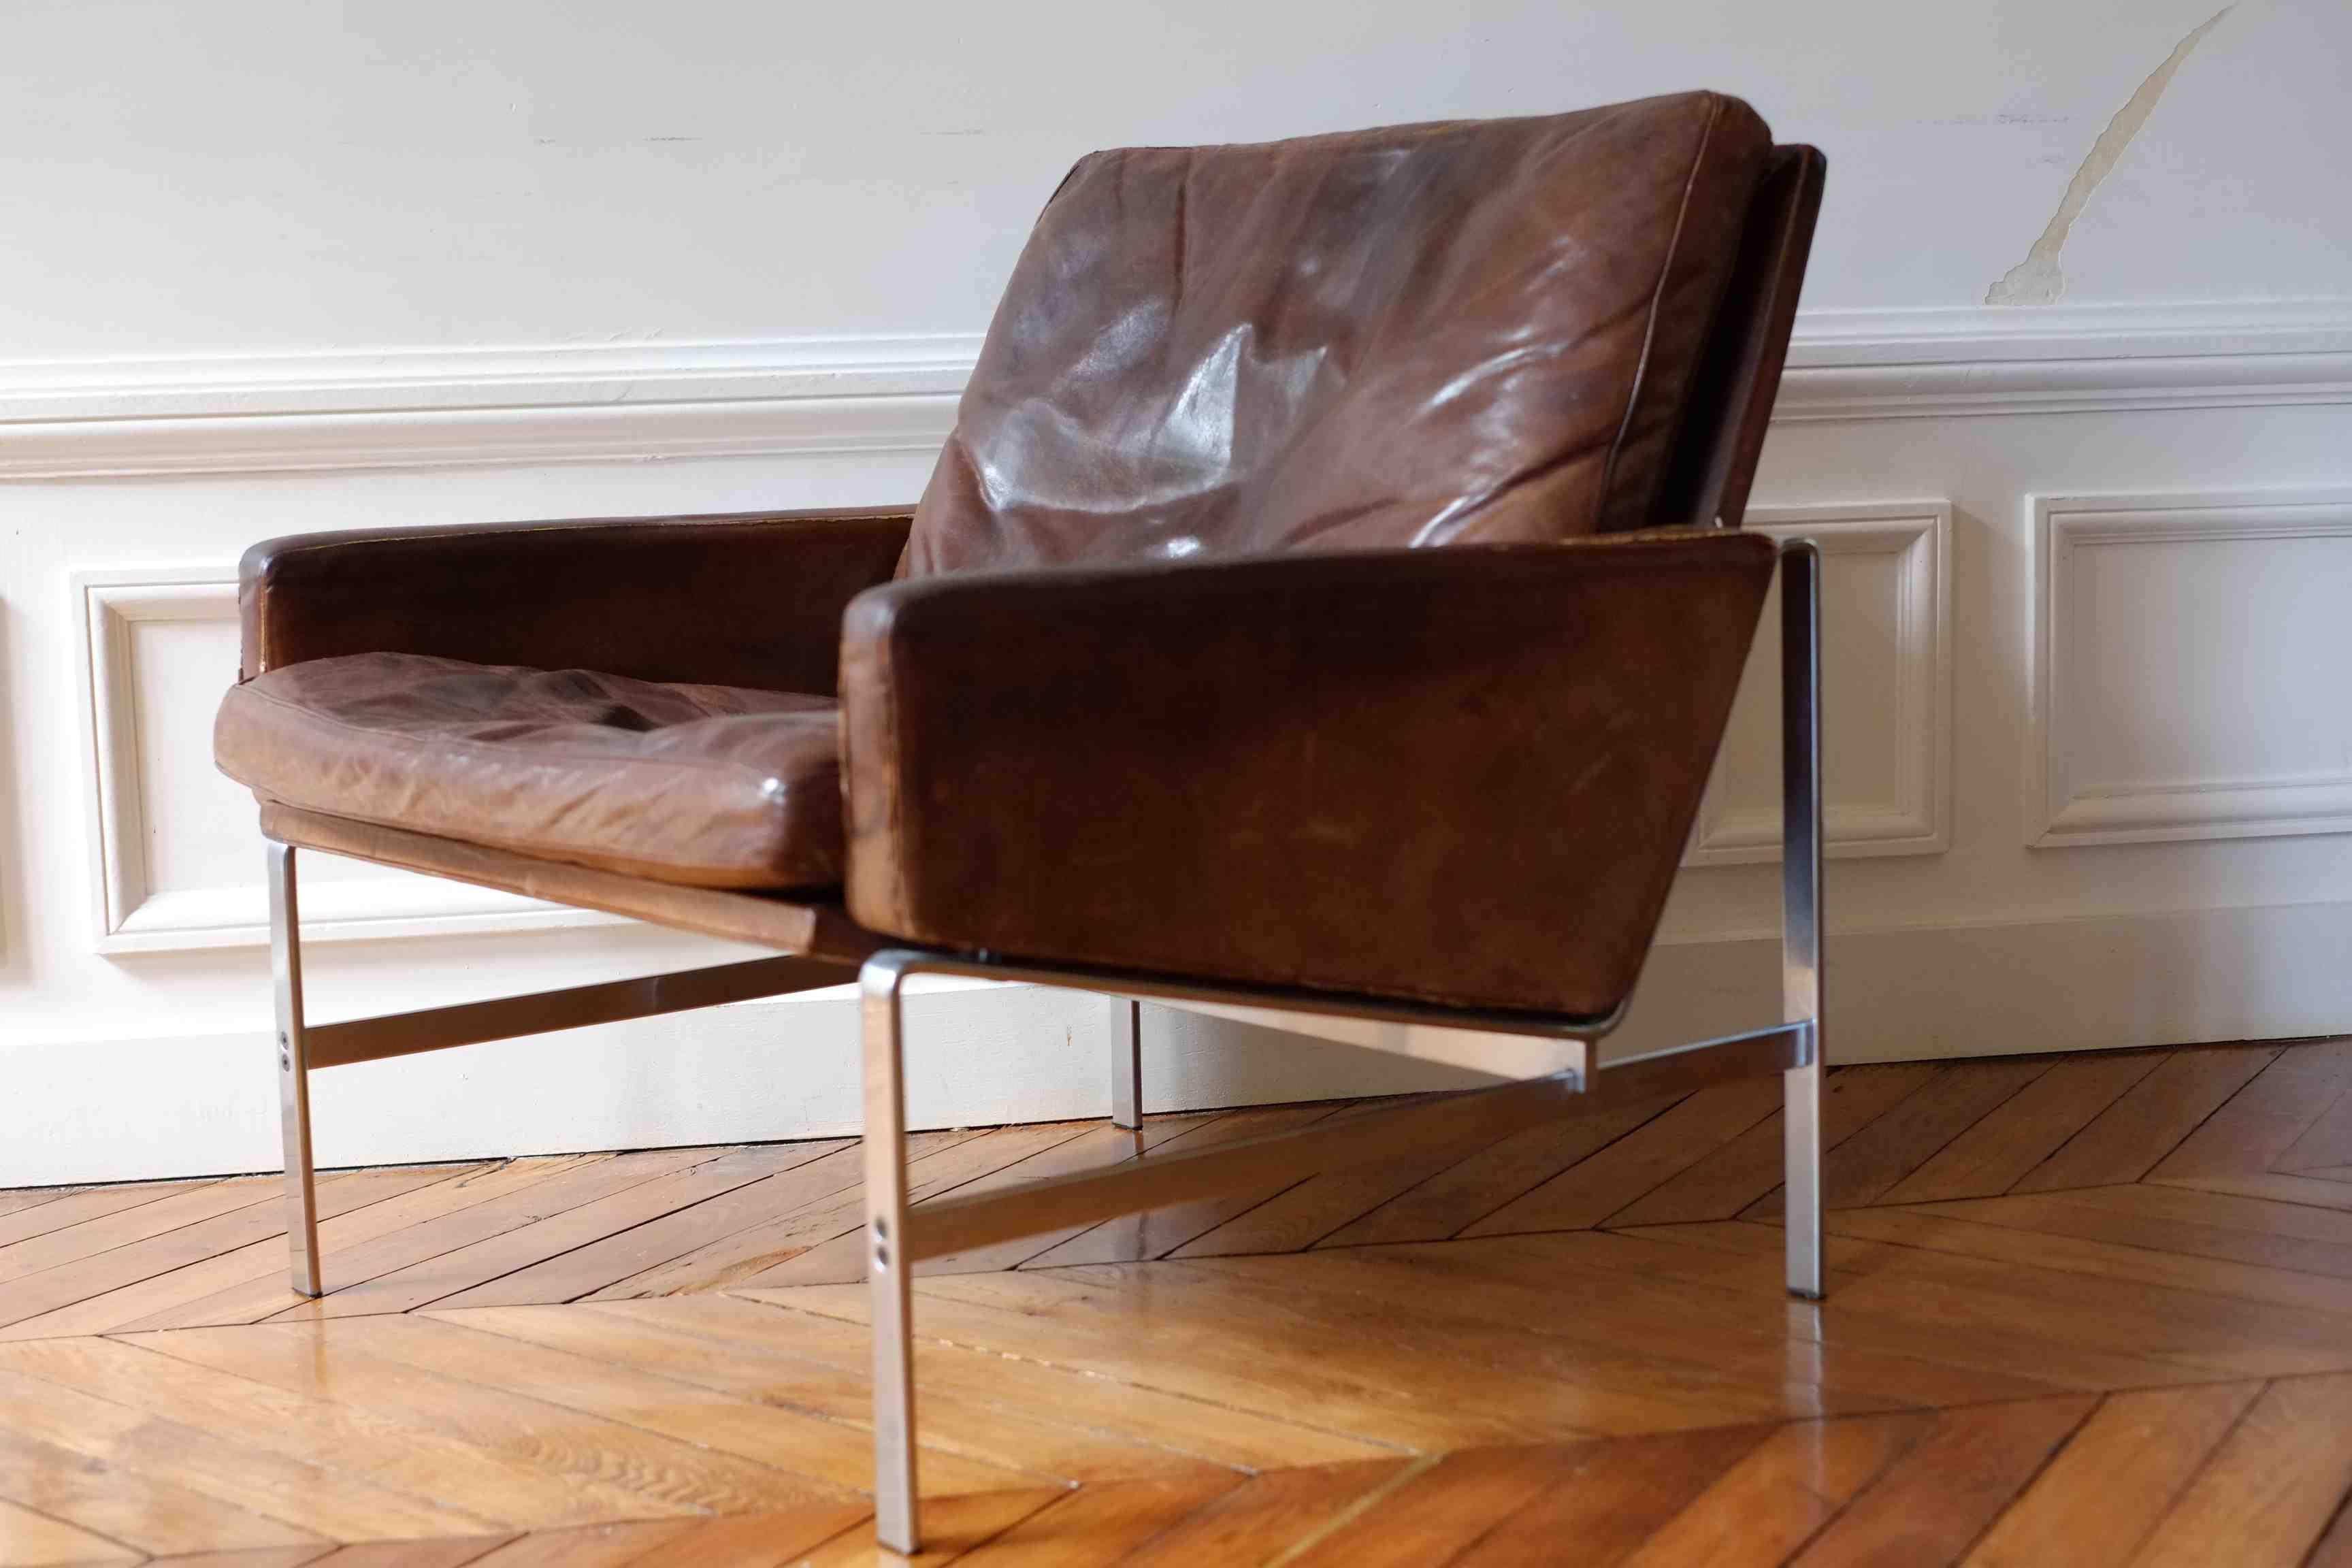 Easy Chair, modèle FK 6720  Preben Fabricius & Jørgen Kastholm  Alfred Kill International 1968